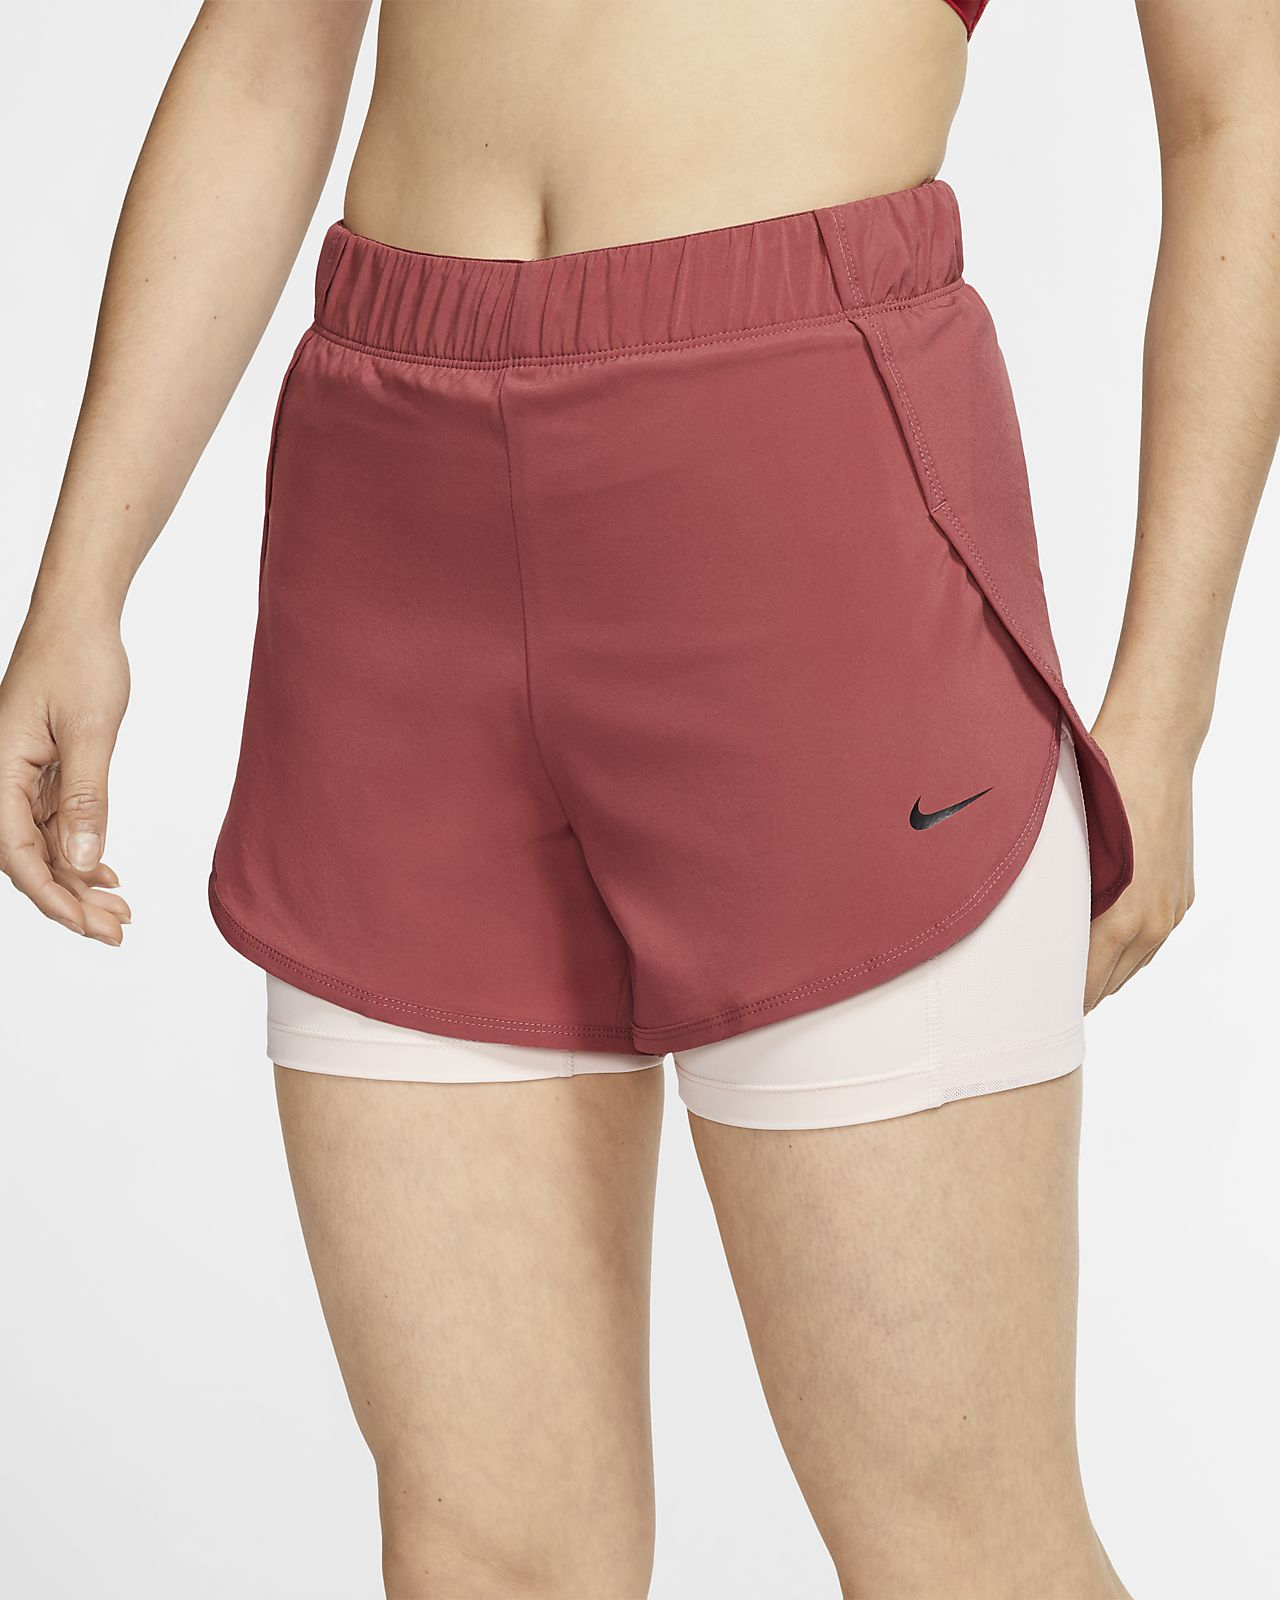 nike 2 in 1 shorts